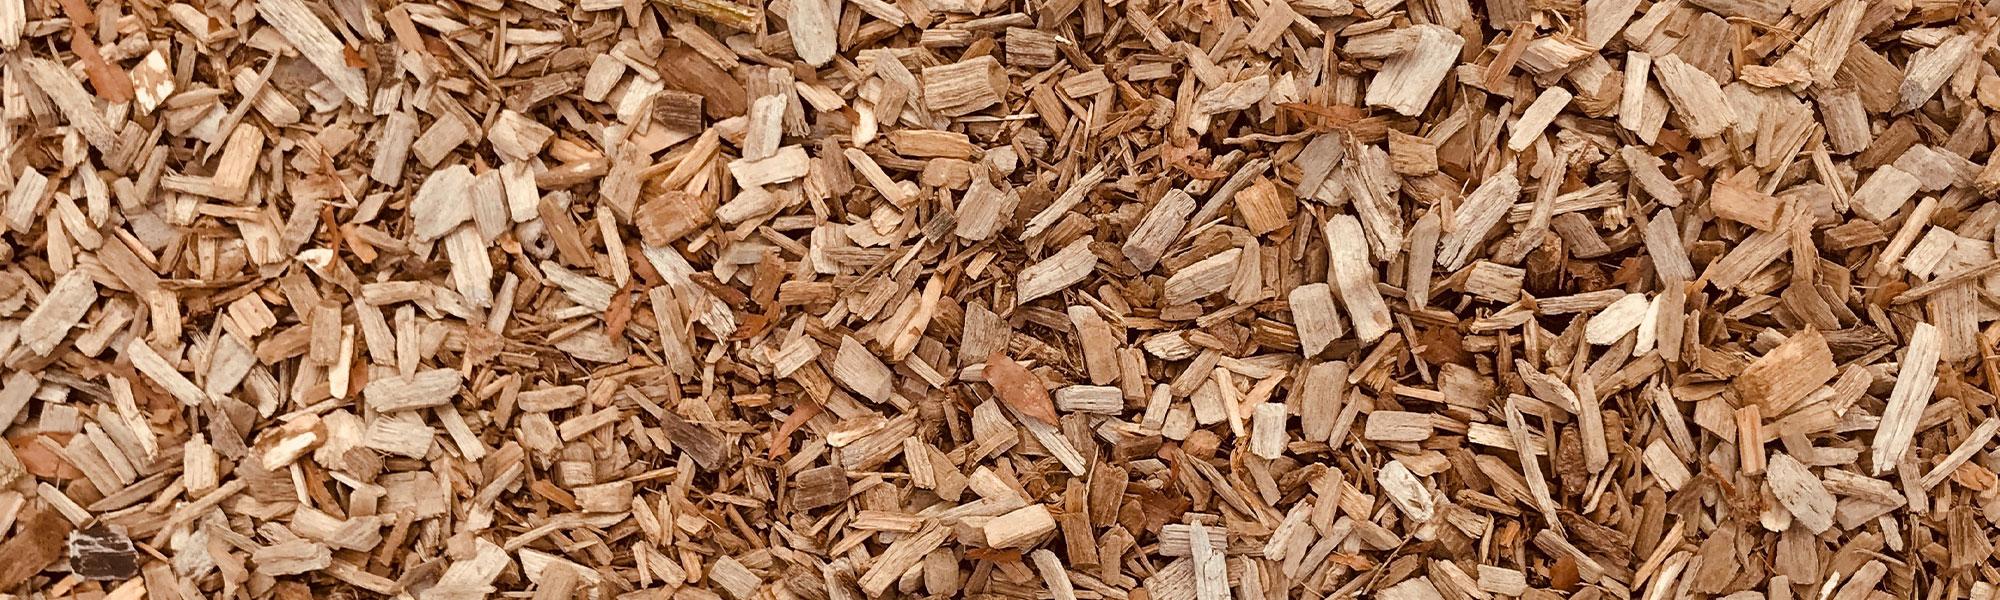 Mulch sample